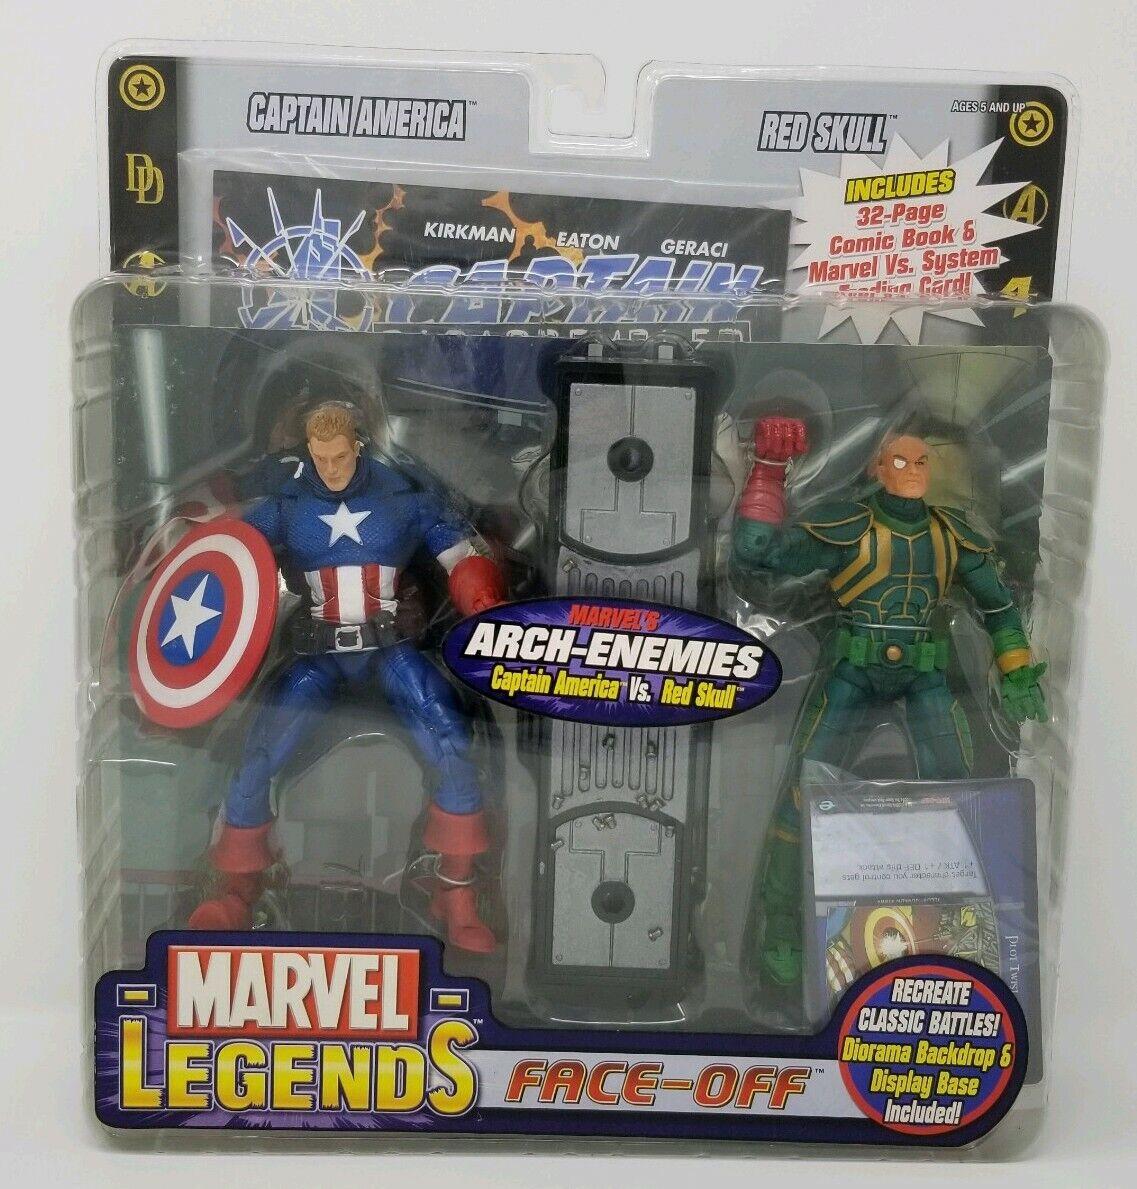 Marvel Legends Face-Off Arch Enemies  Captain America vs rosso Skull Comic NIB  online economico